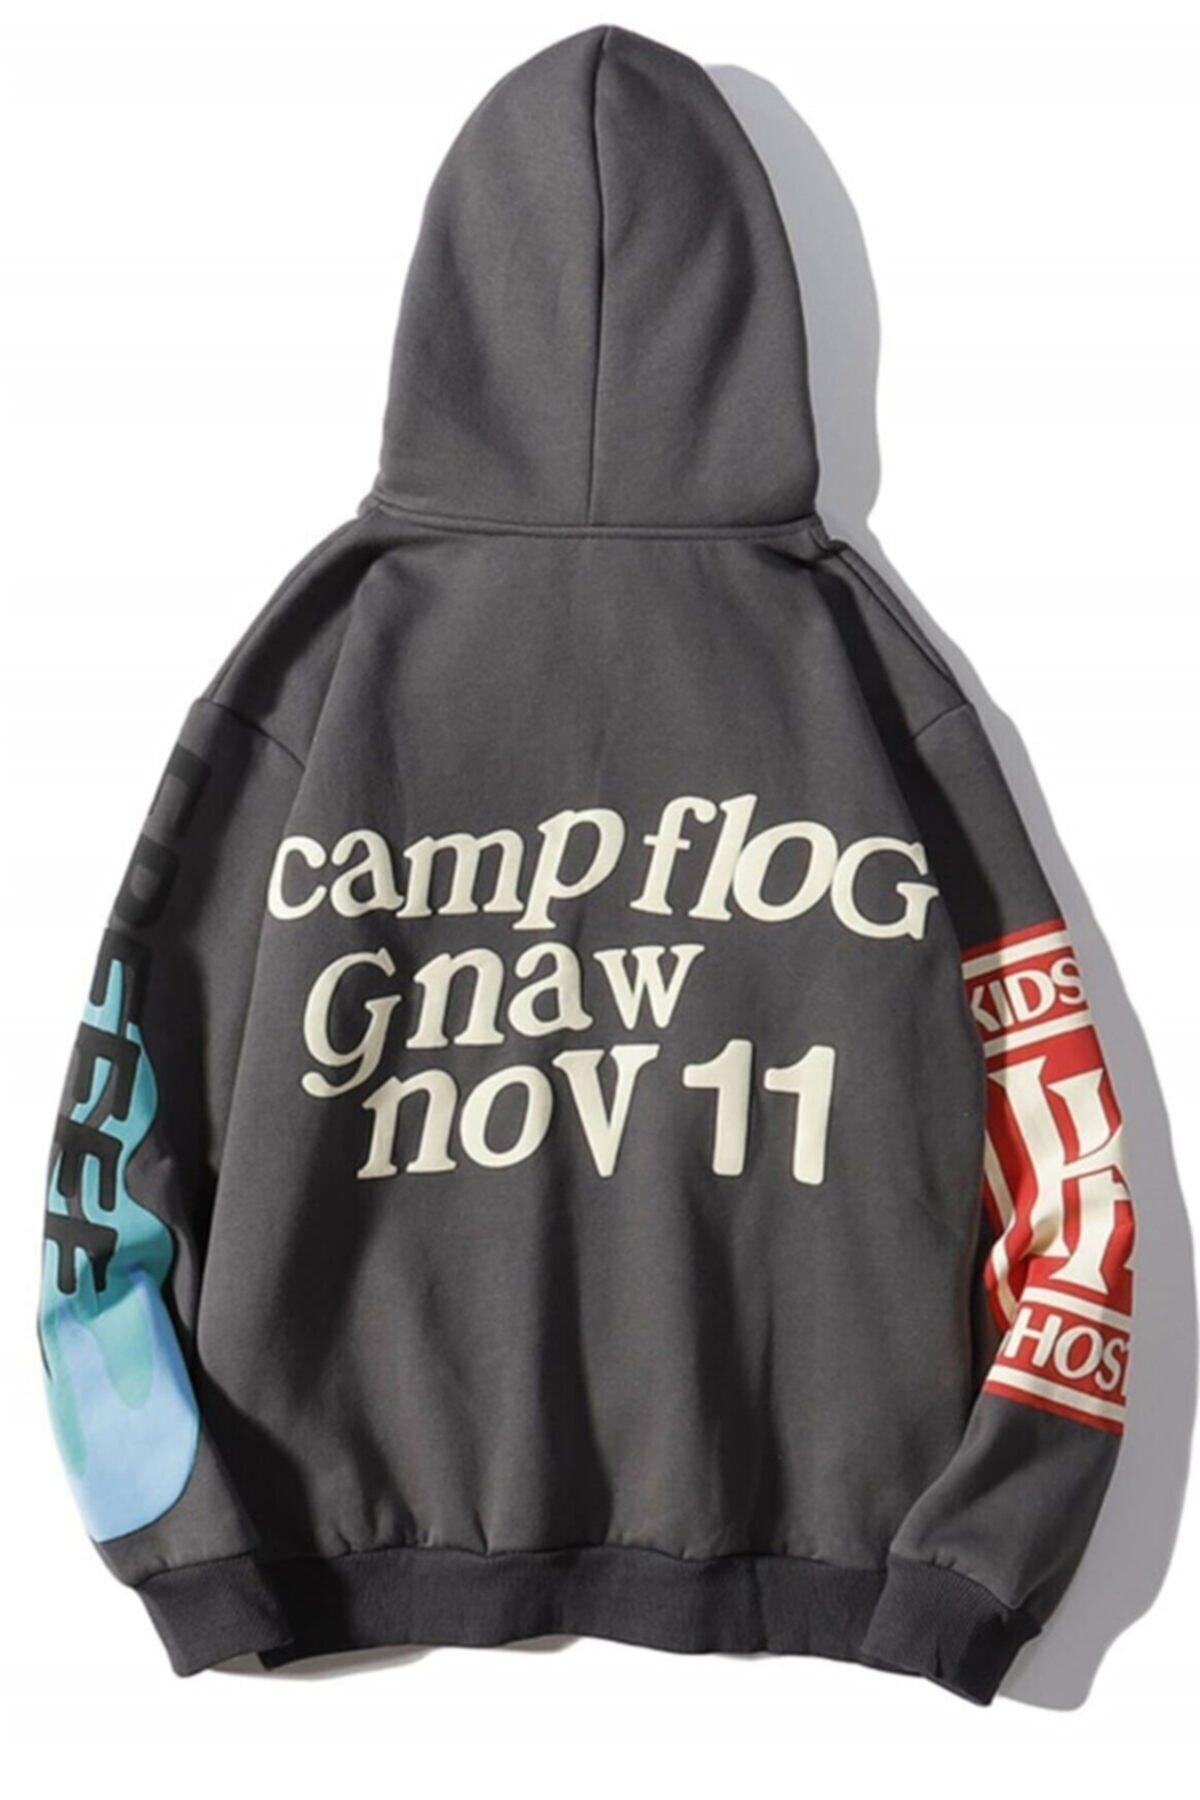 Madmext Mad Girls Antrasit Baskılı Oversize Sweatshirt Mg903 2